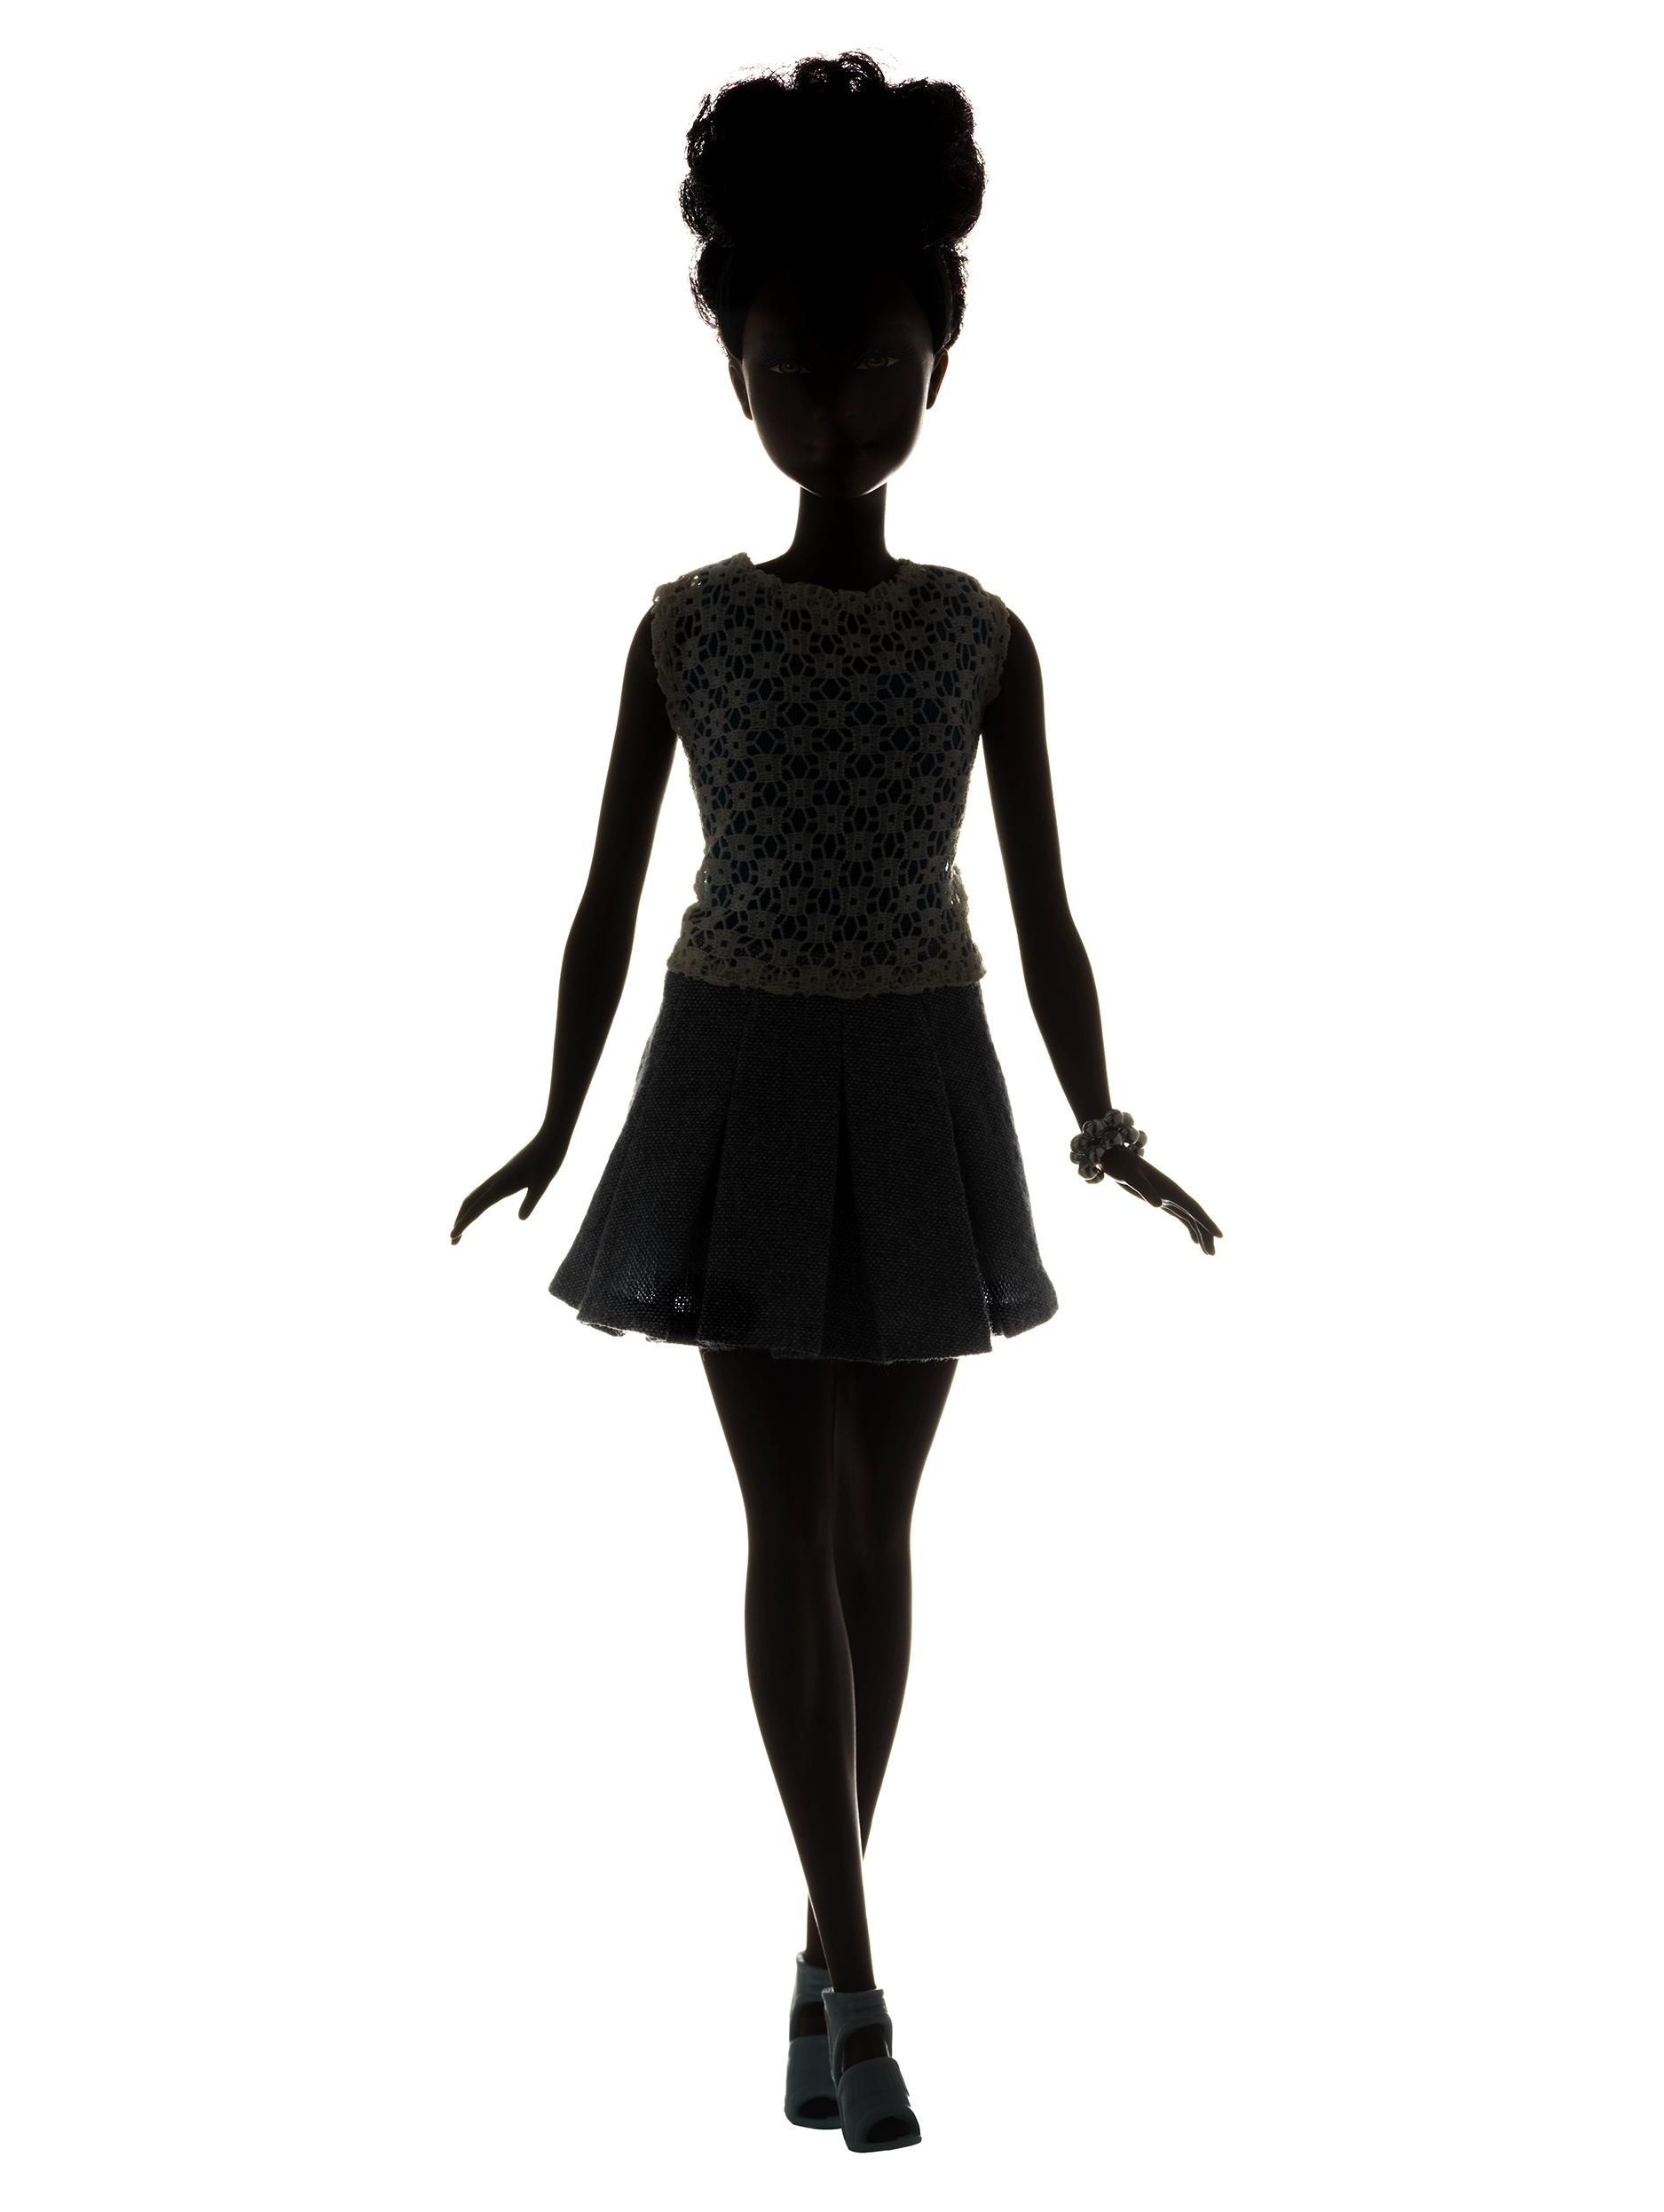 A silhouette of Mattel's new Petite Barbie